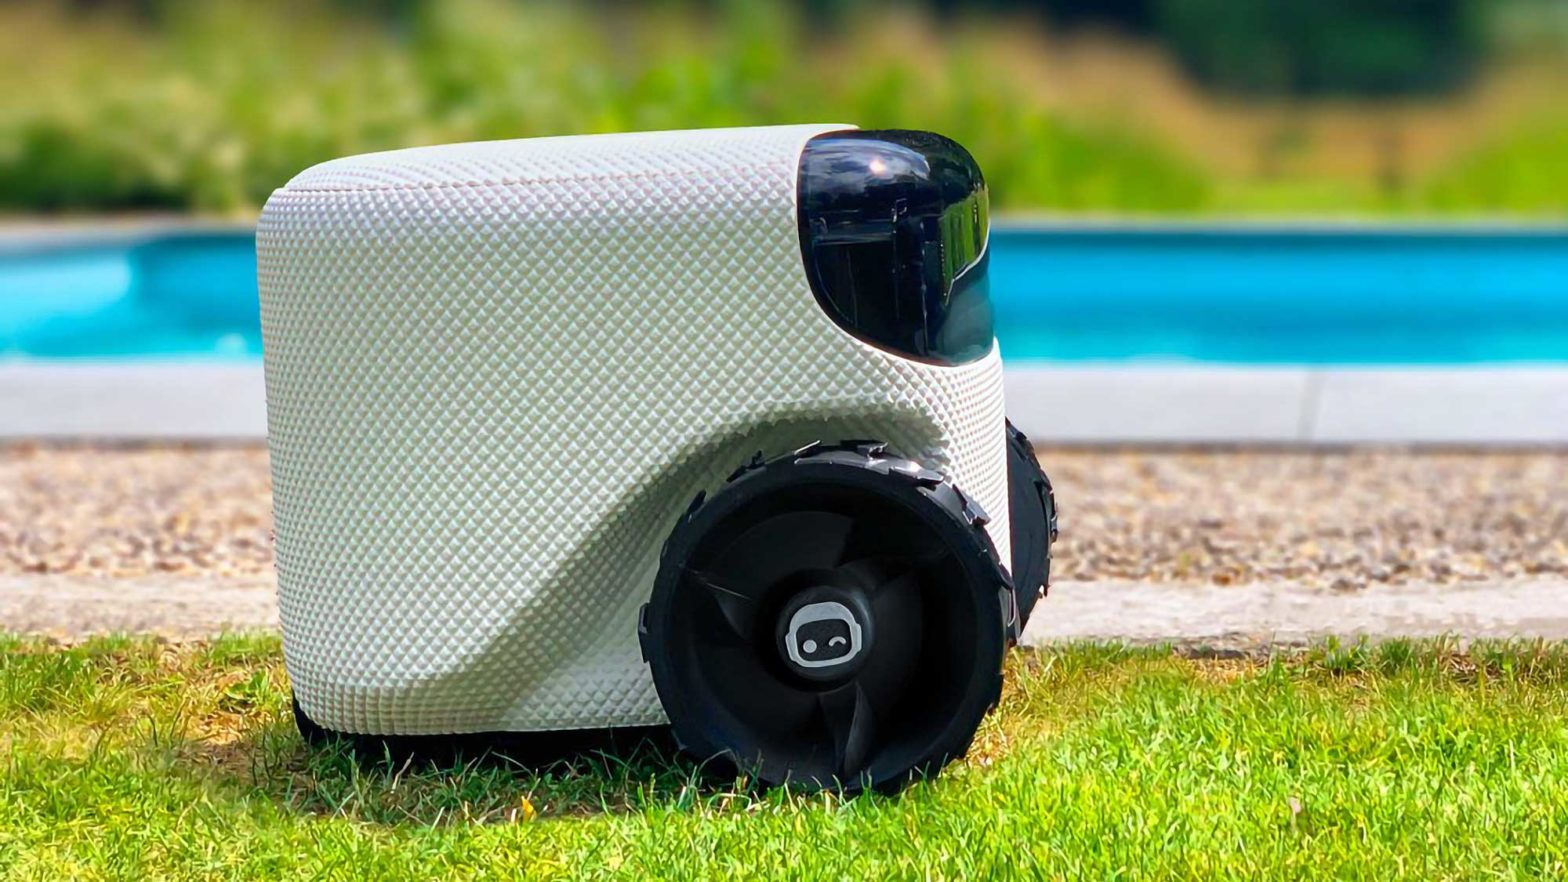 Toadi AI-powered Autonomous Lawn Mower